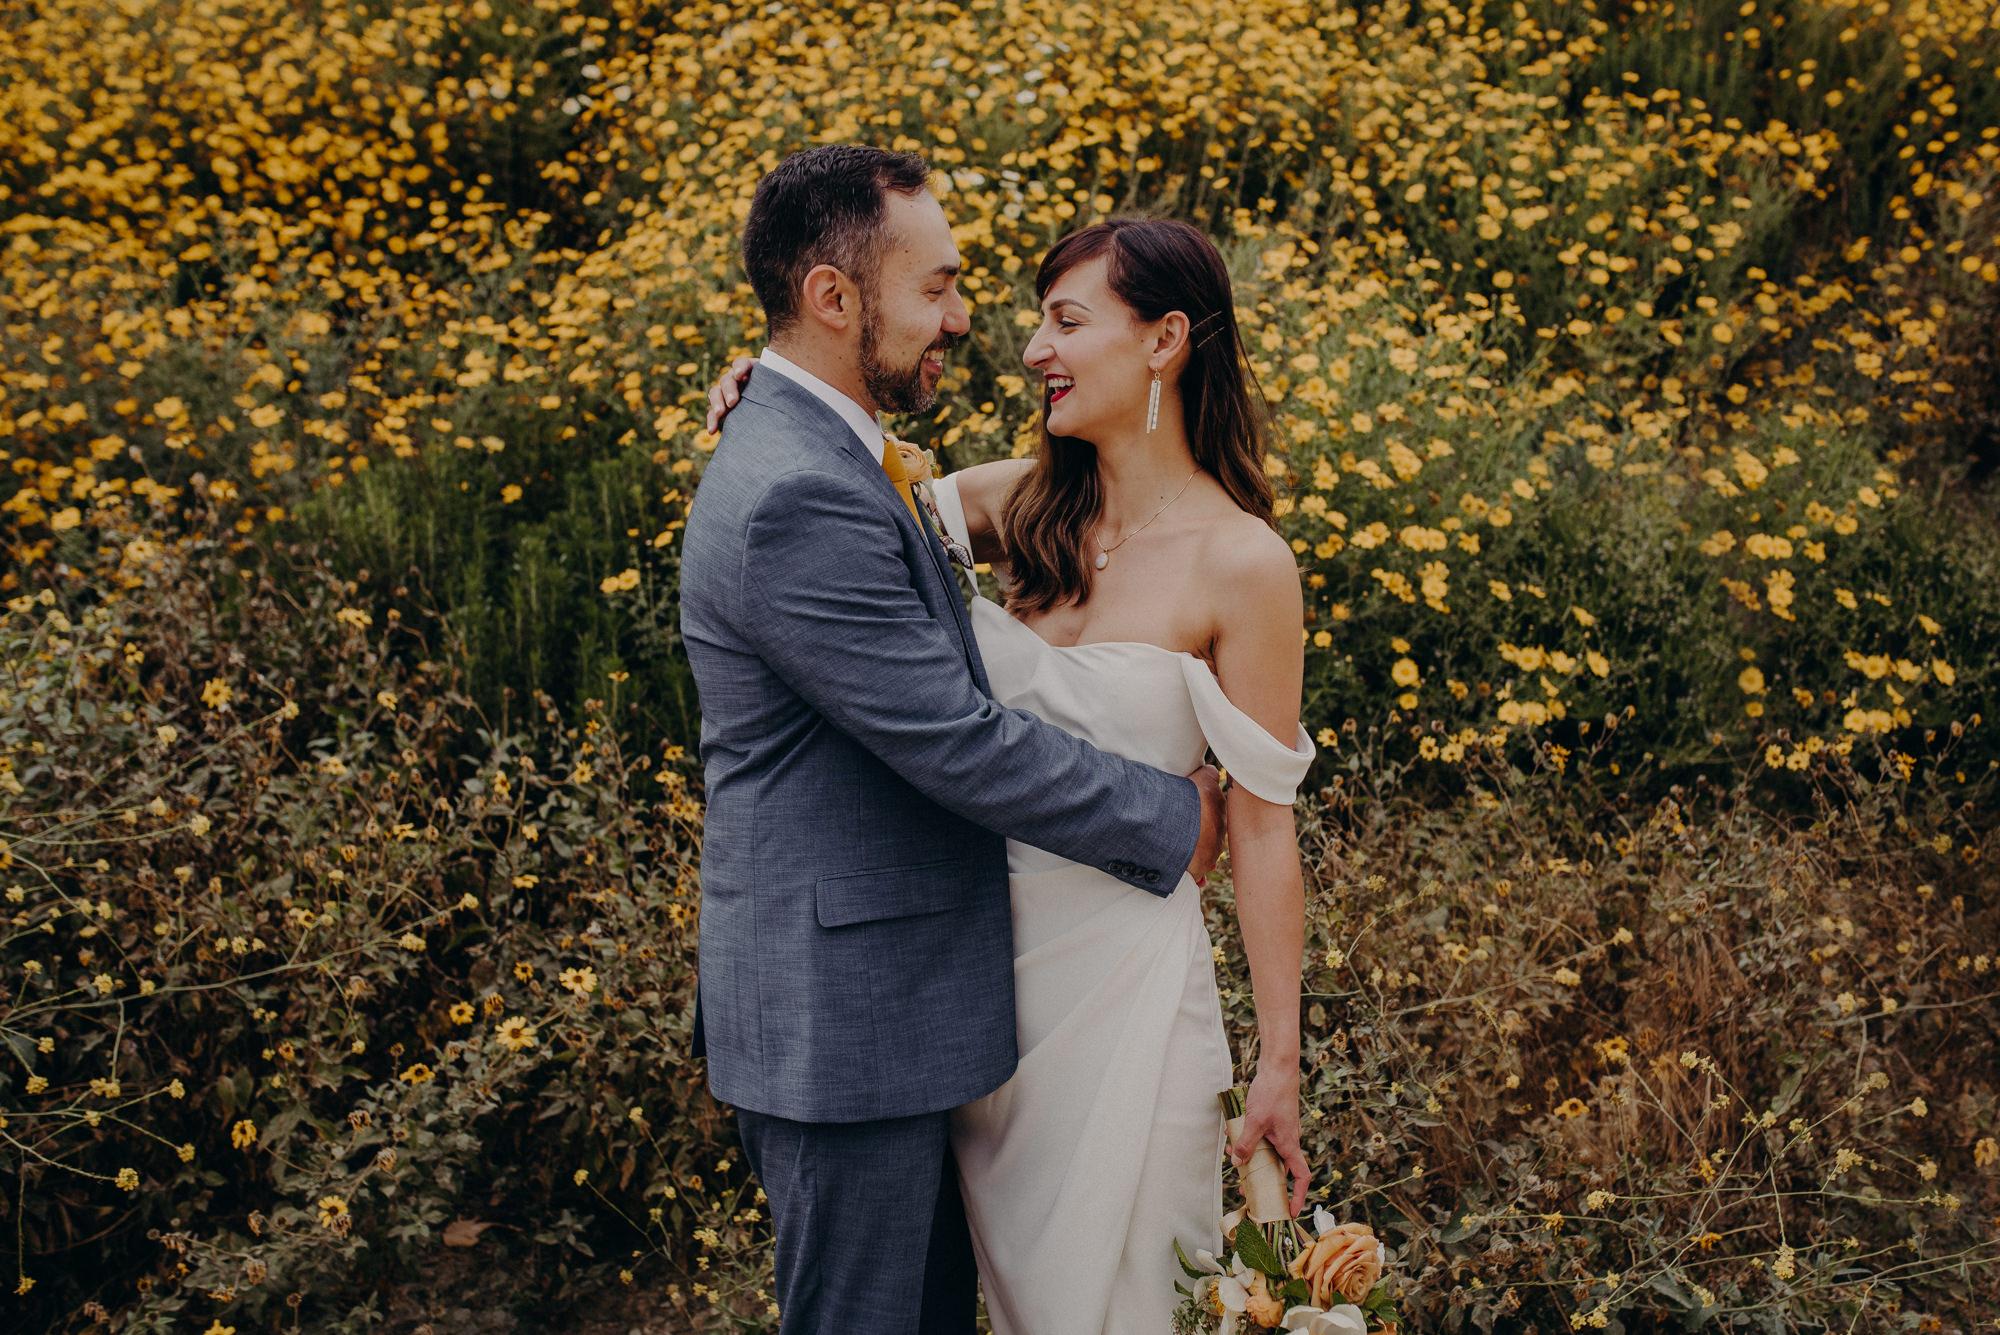 elopement photographer in los angeles - la wedding photographer - isaiahandtaylor.com-021.jpg